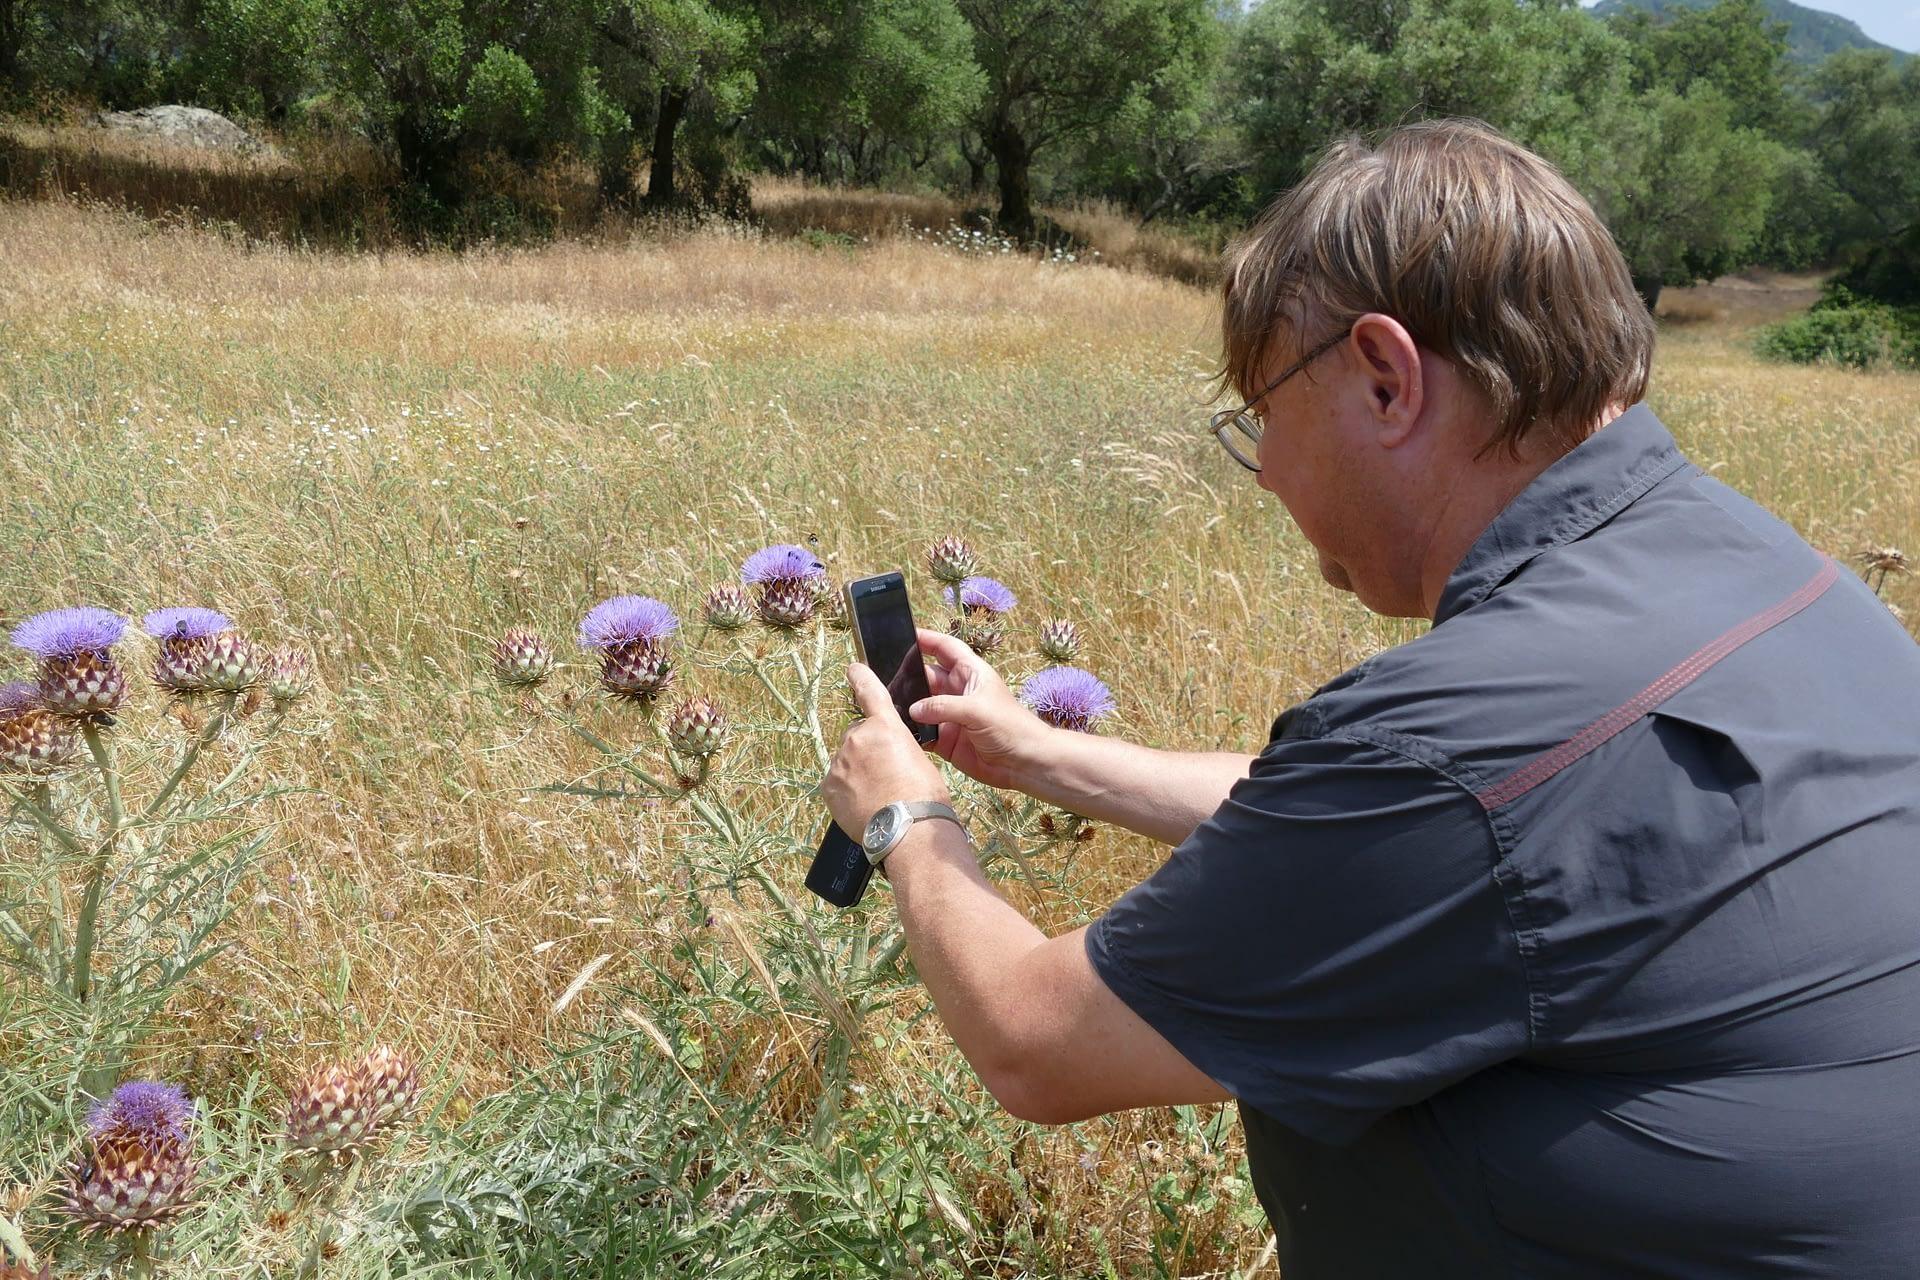 Naturalists-in-residence: biodiversity studies